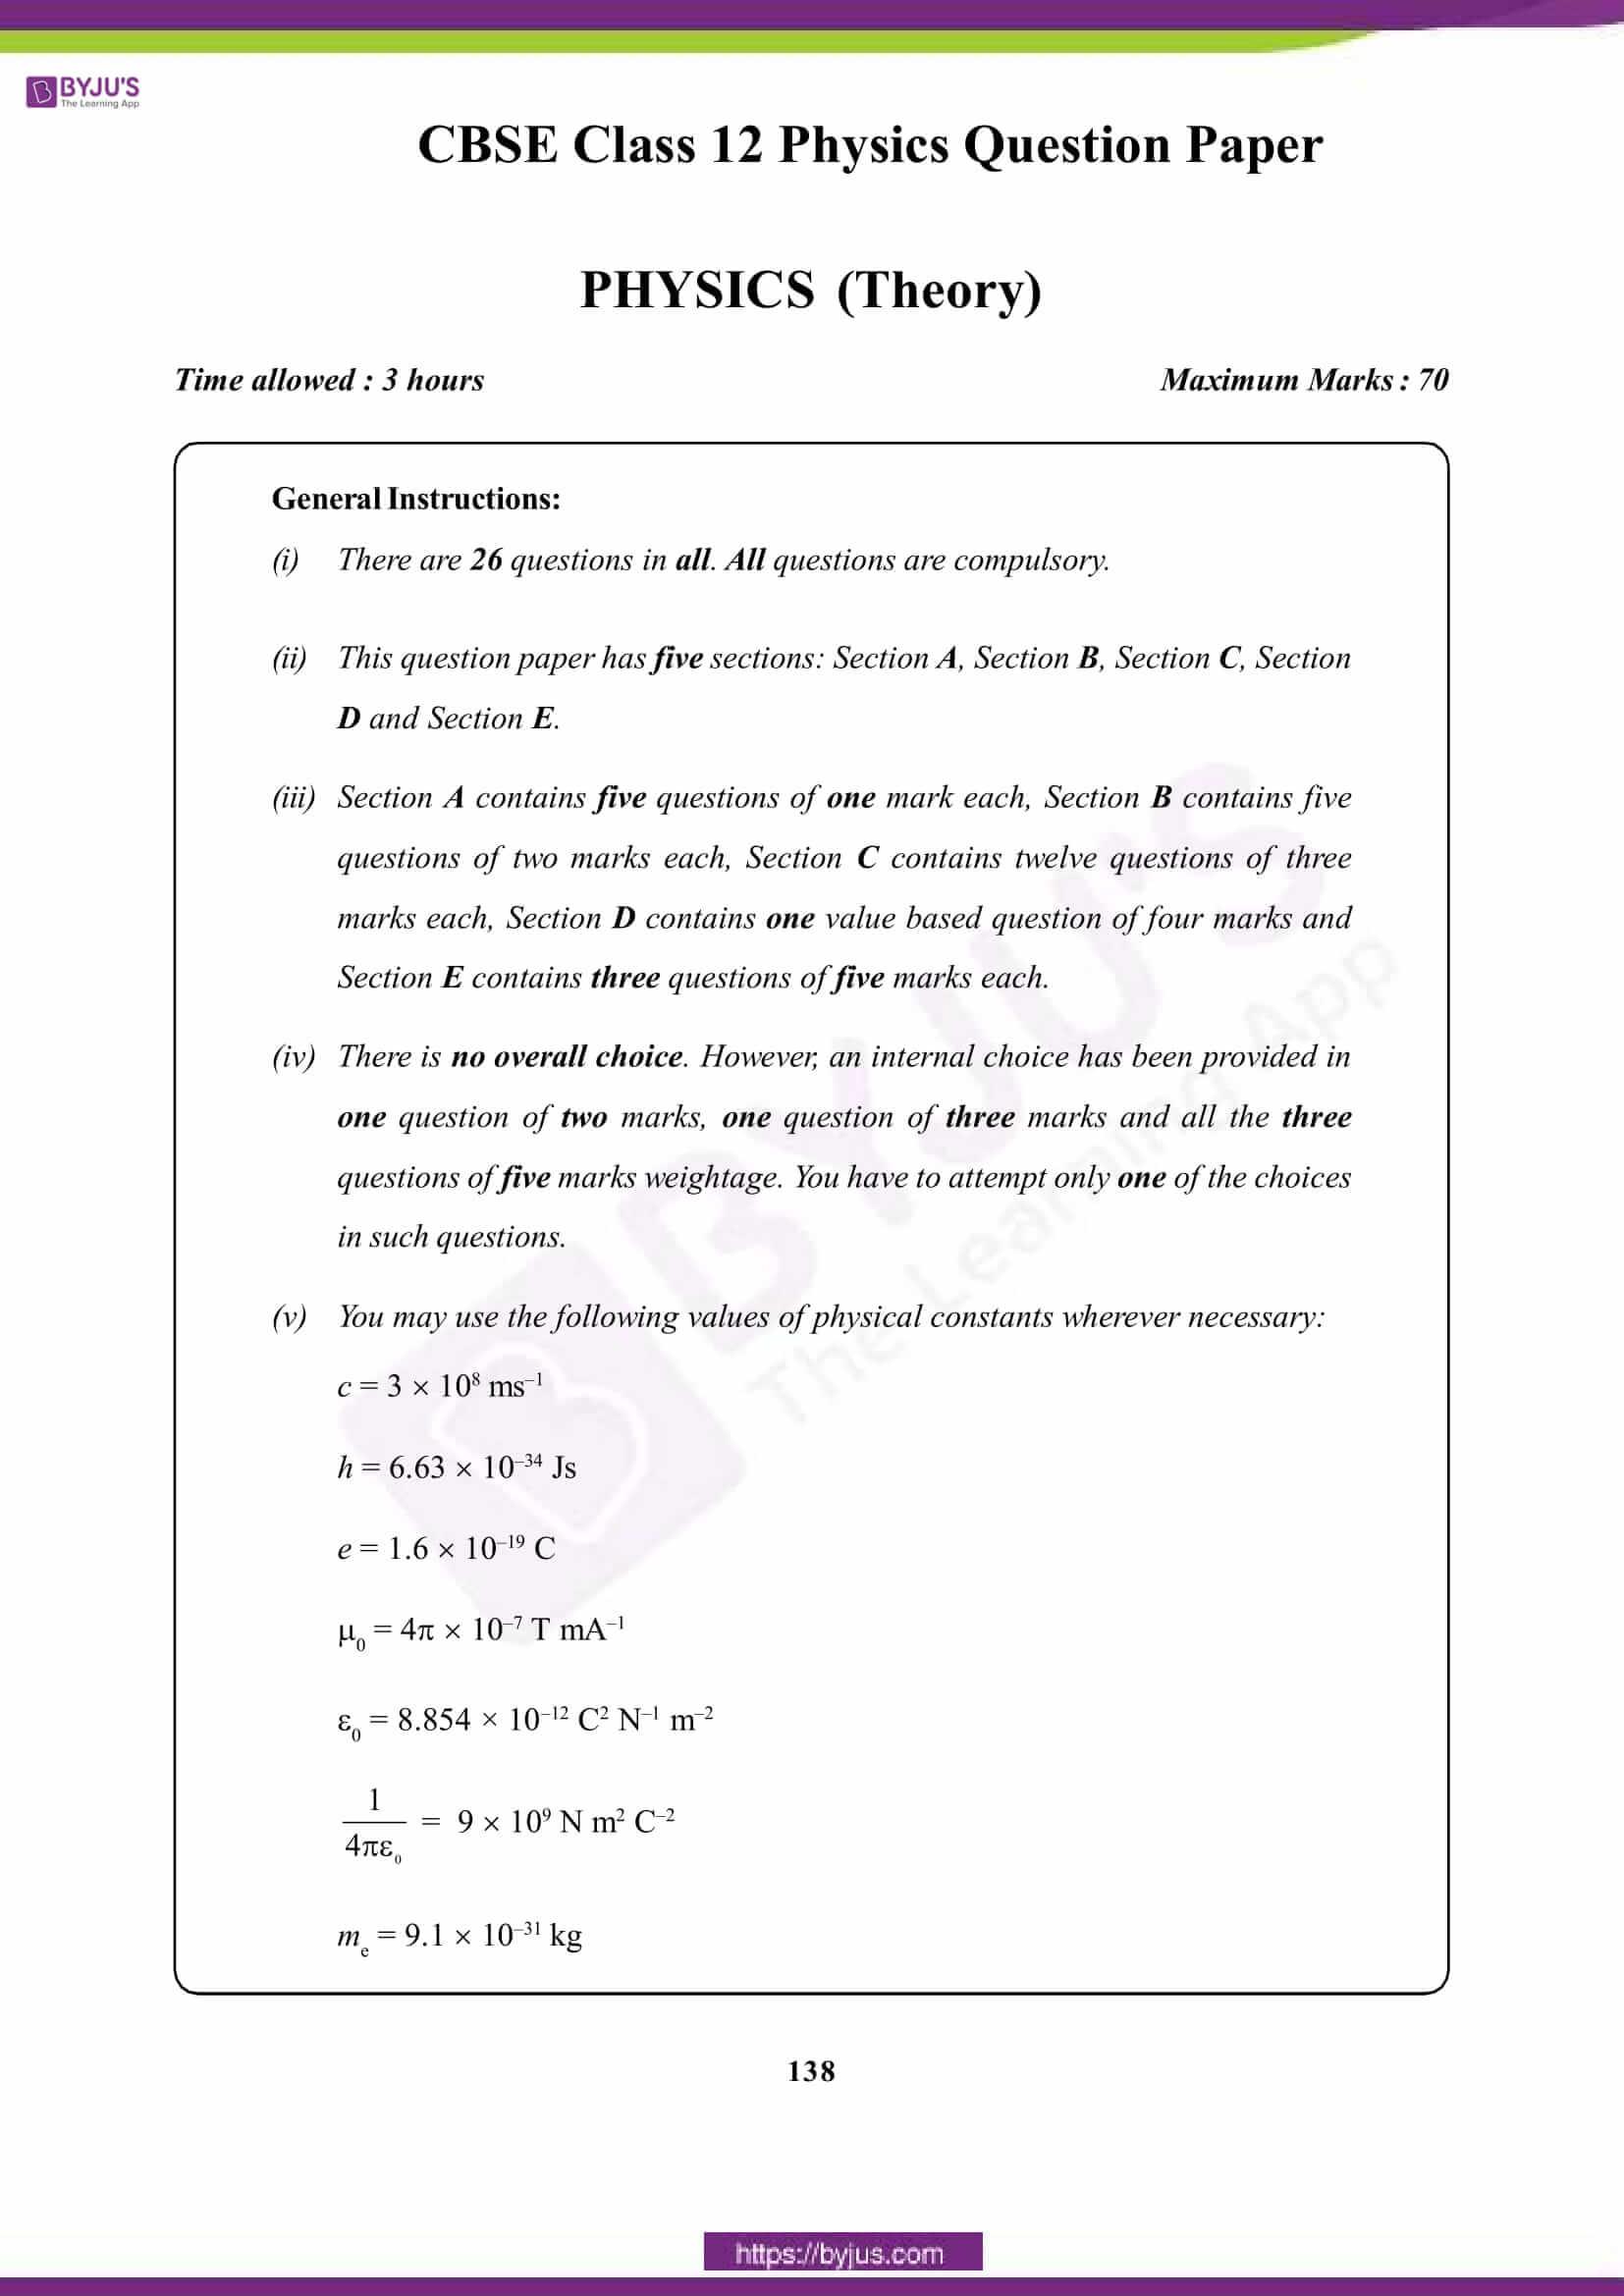 cbse class 12 phy 2015 question paper set 1